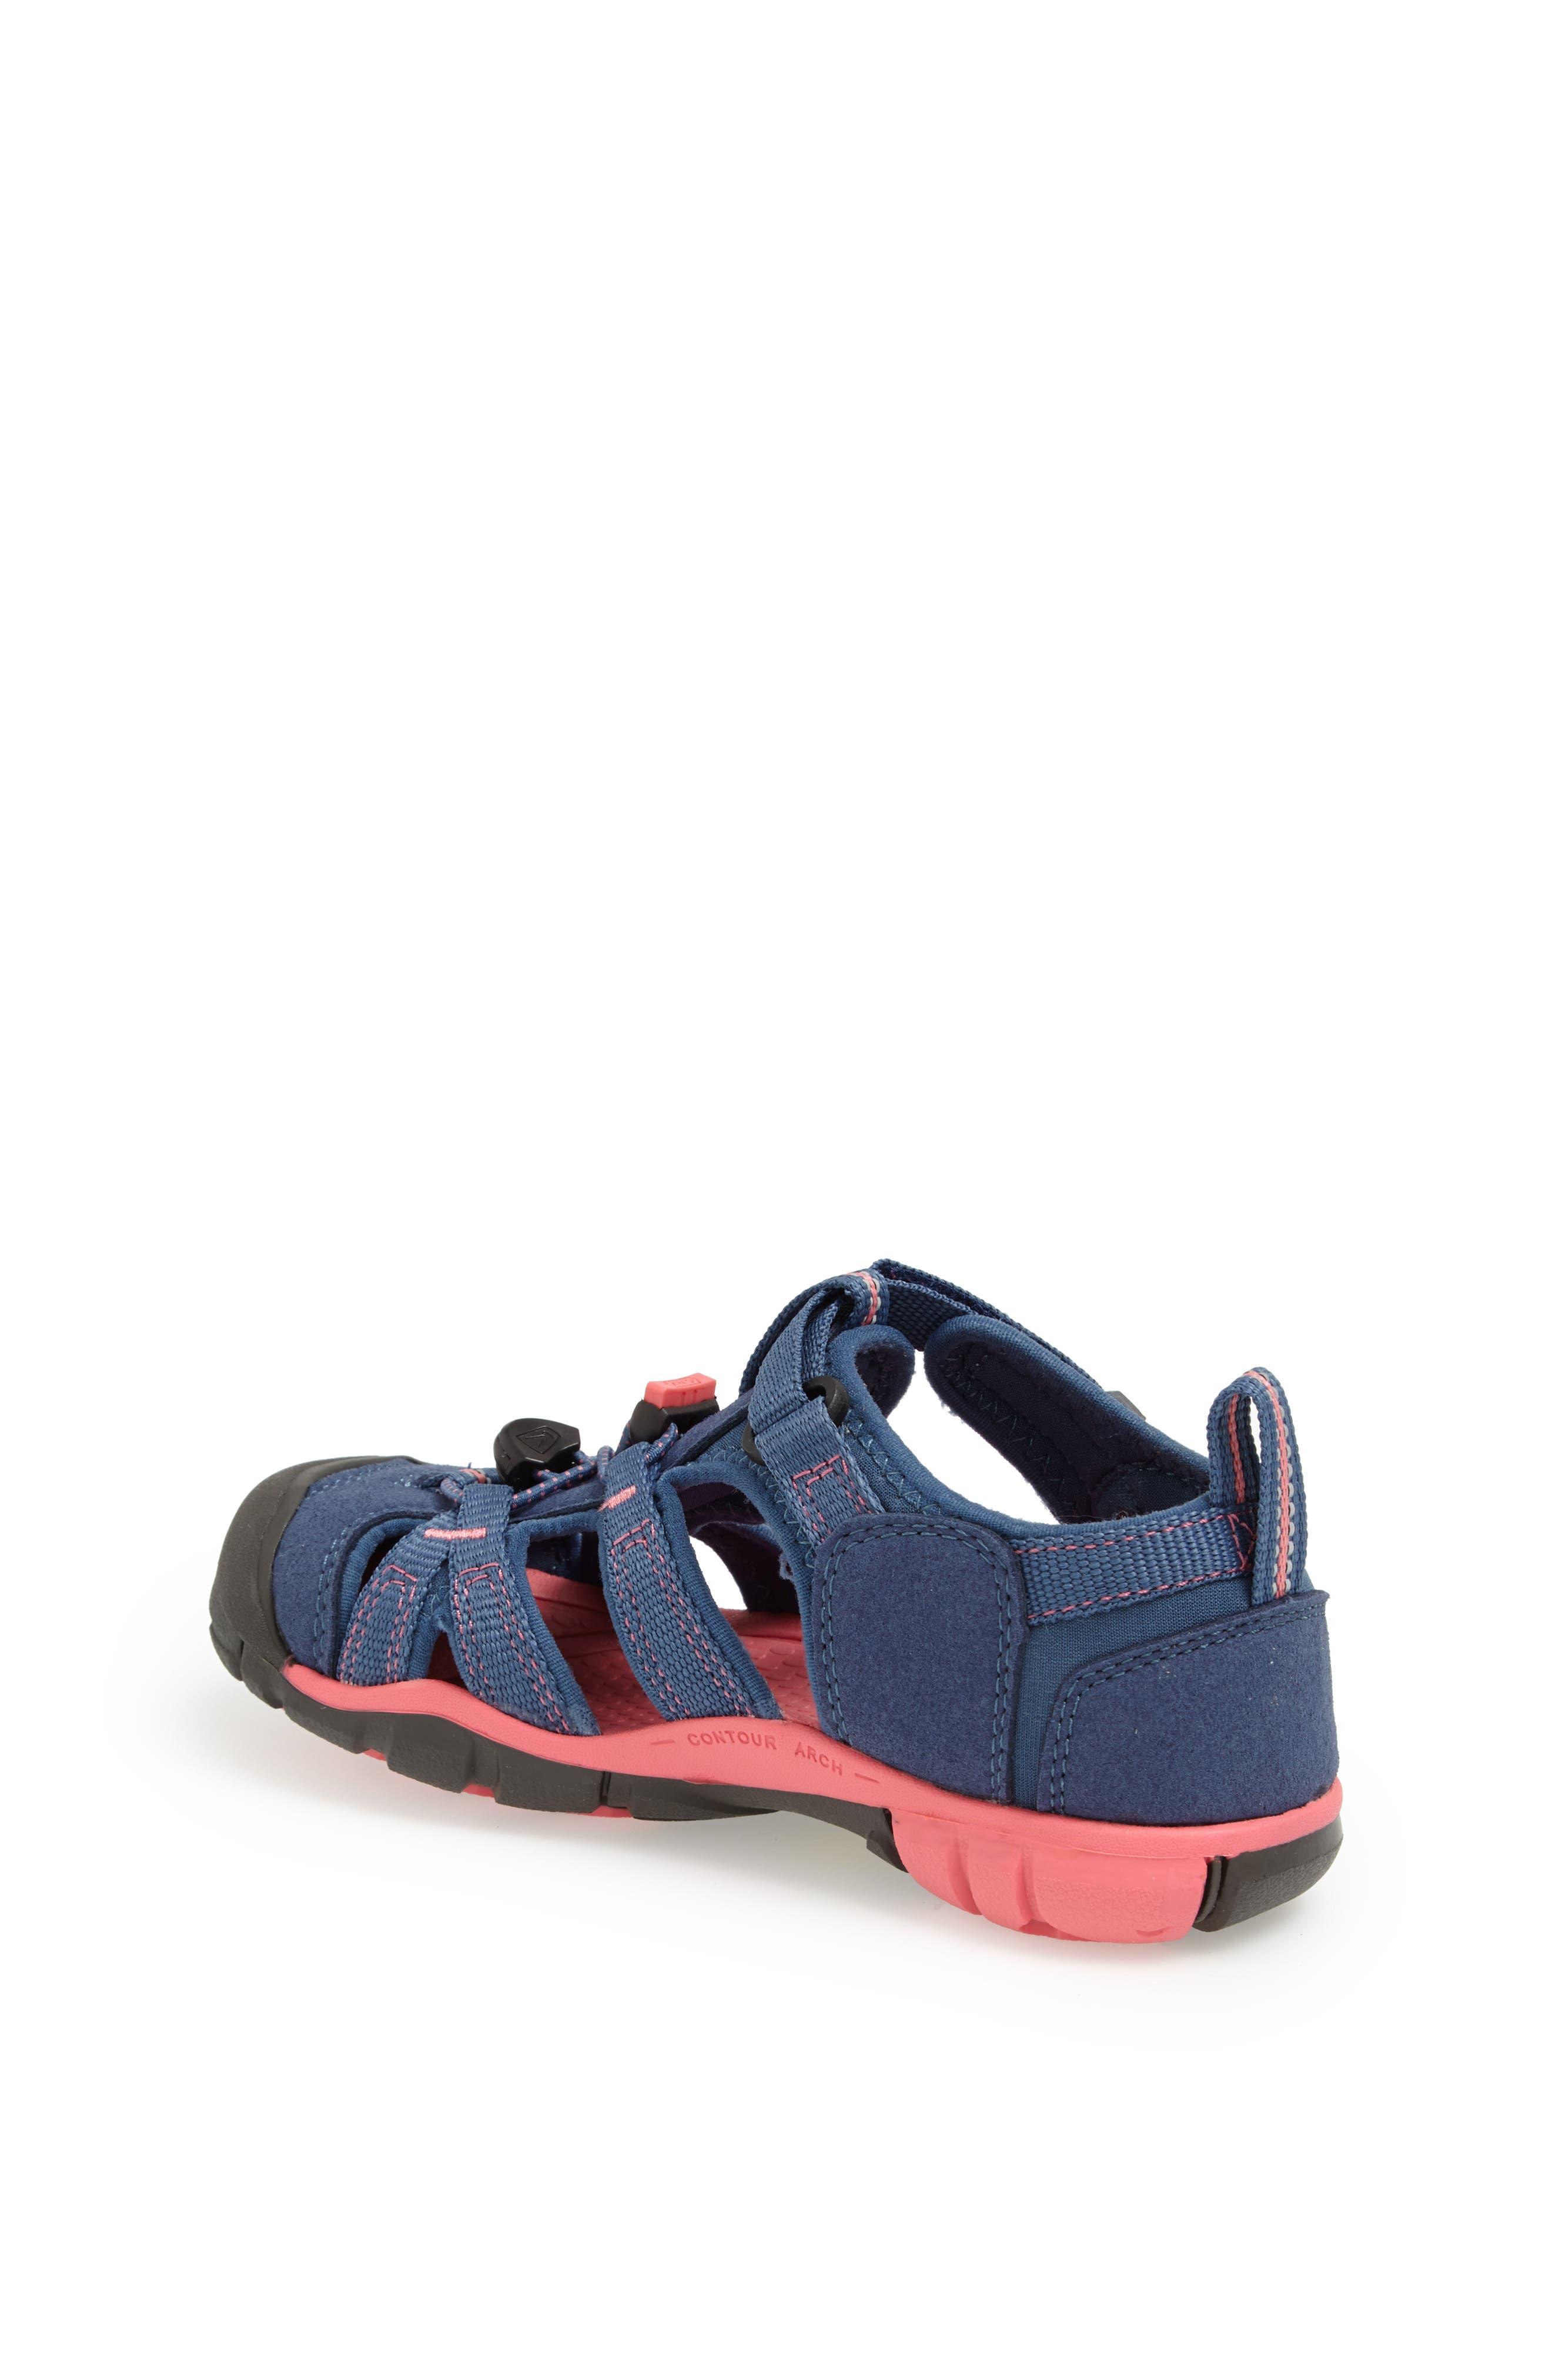 ,                             'Seacamp II' Water Friendly Sandal,                             Alternate thumbnail 183, color,                             415